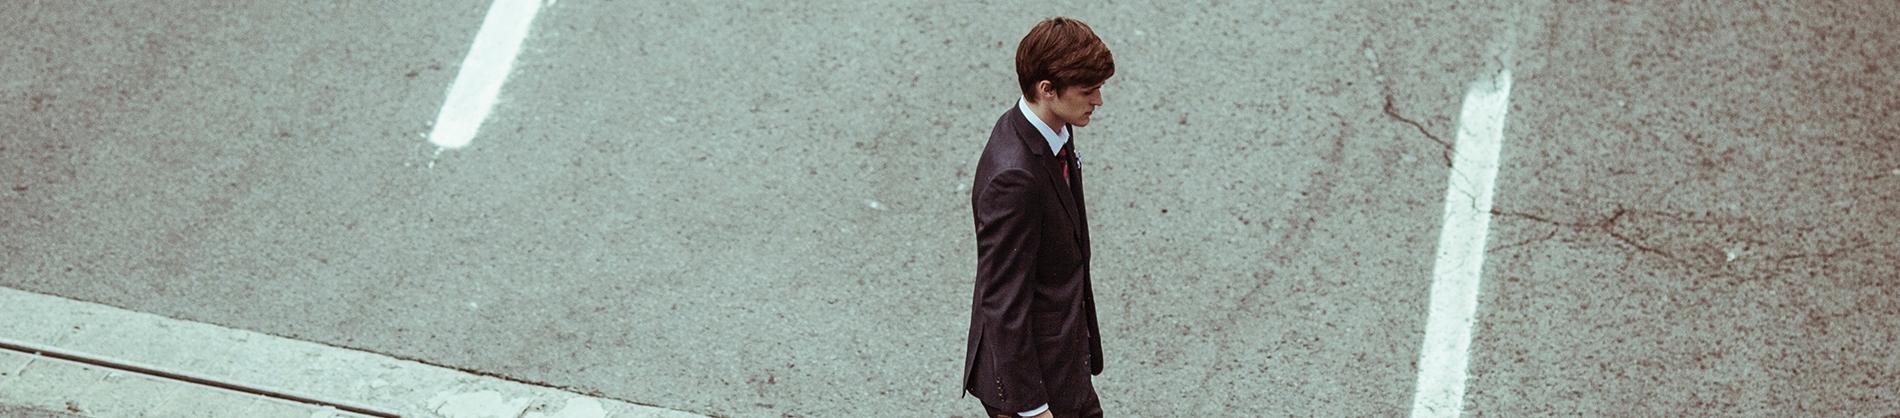 A man dressed in a suit walking across the street